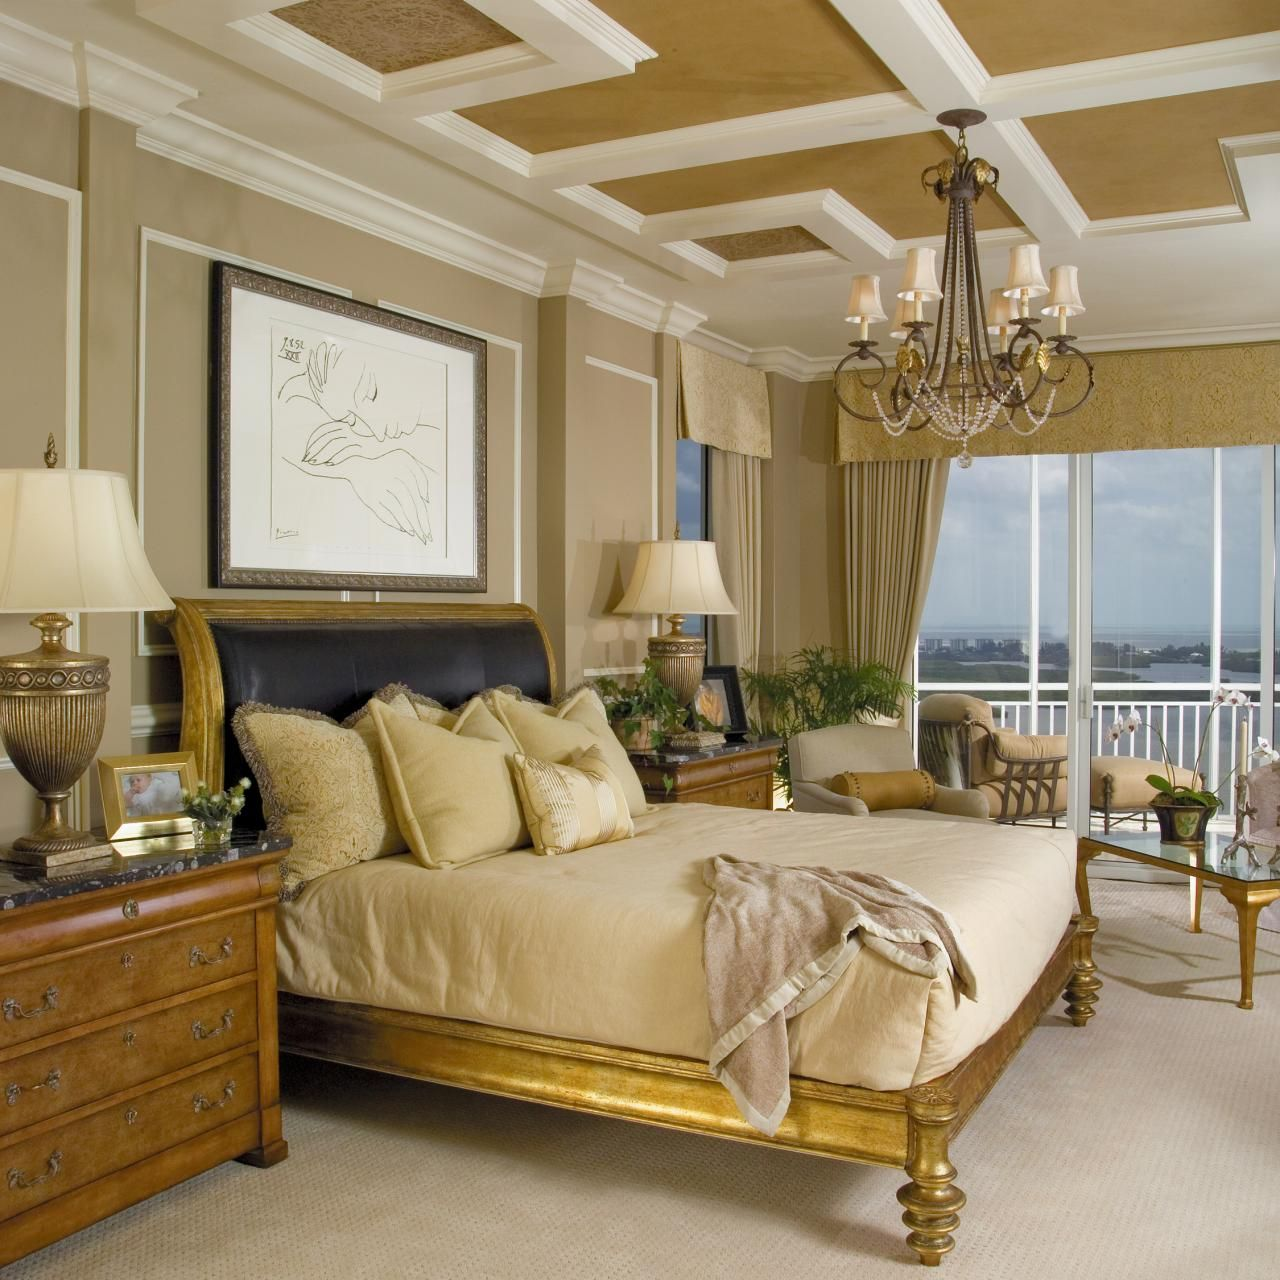 Best Of Designers' Portfolio: Bedrooms